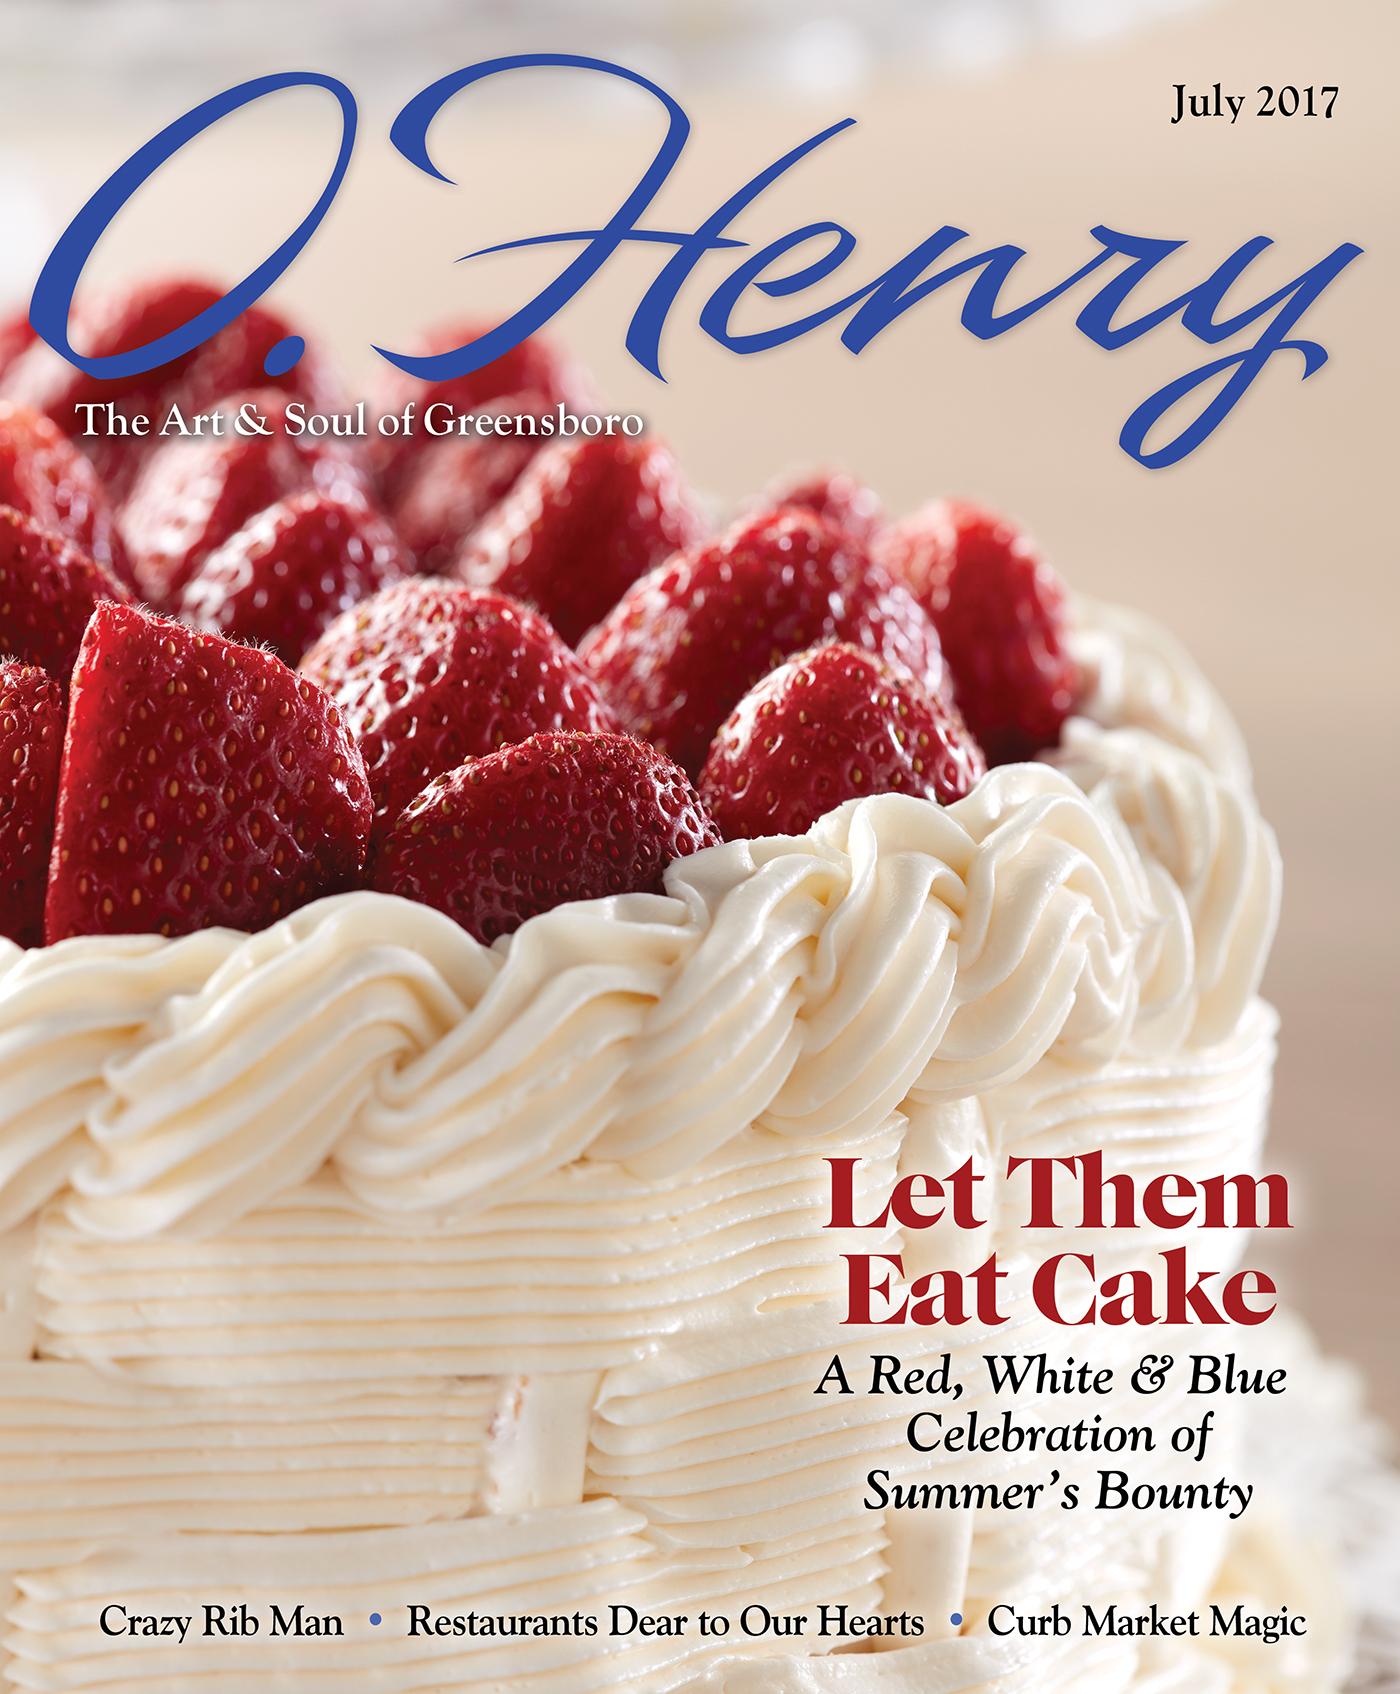 o.henry-cover-july-facebook